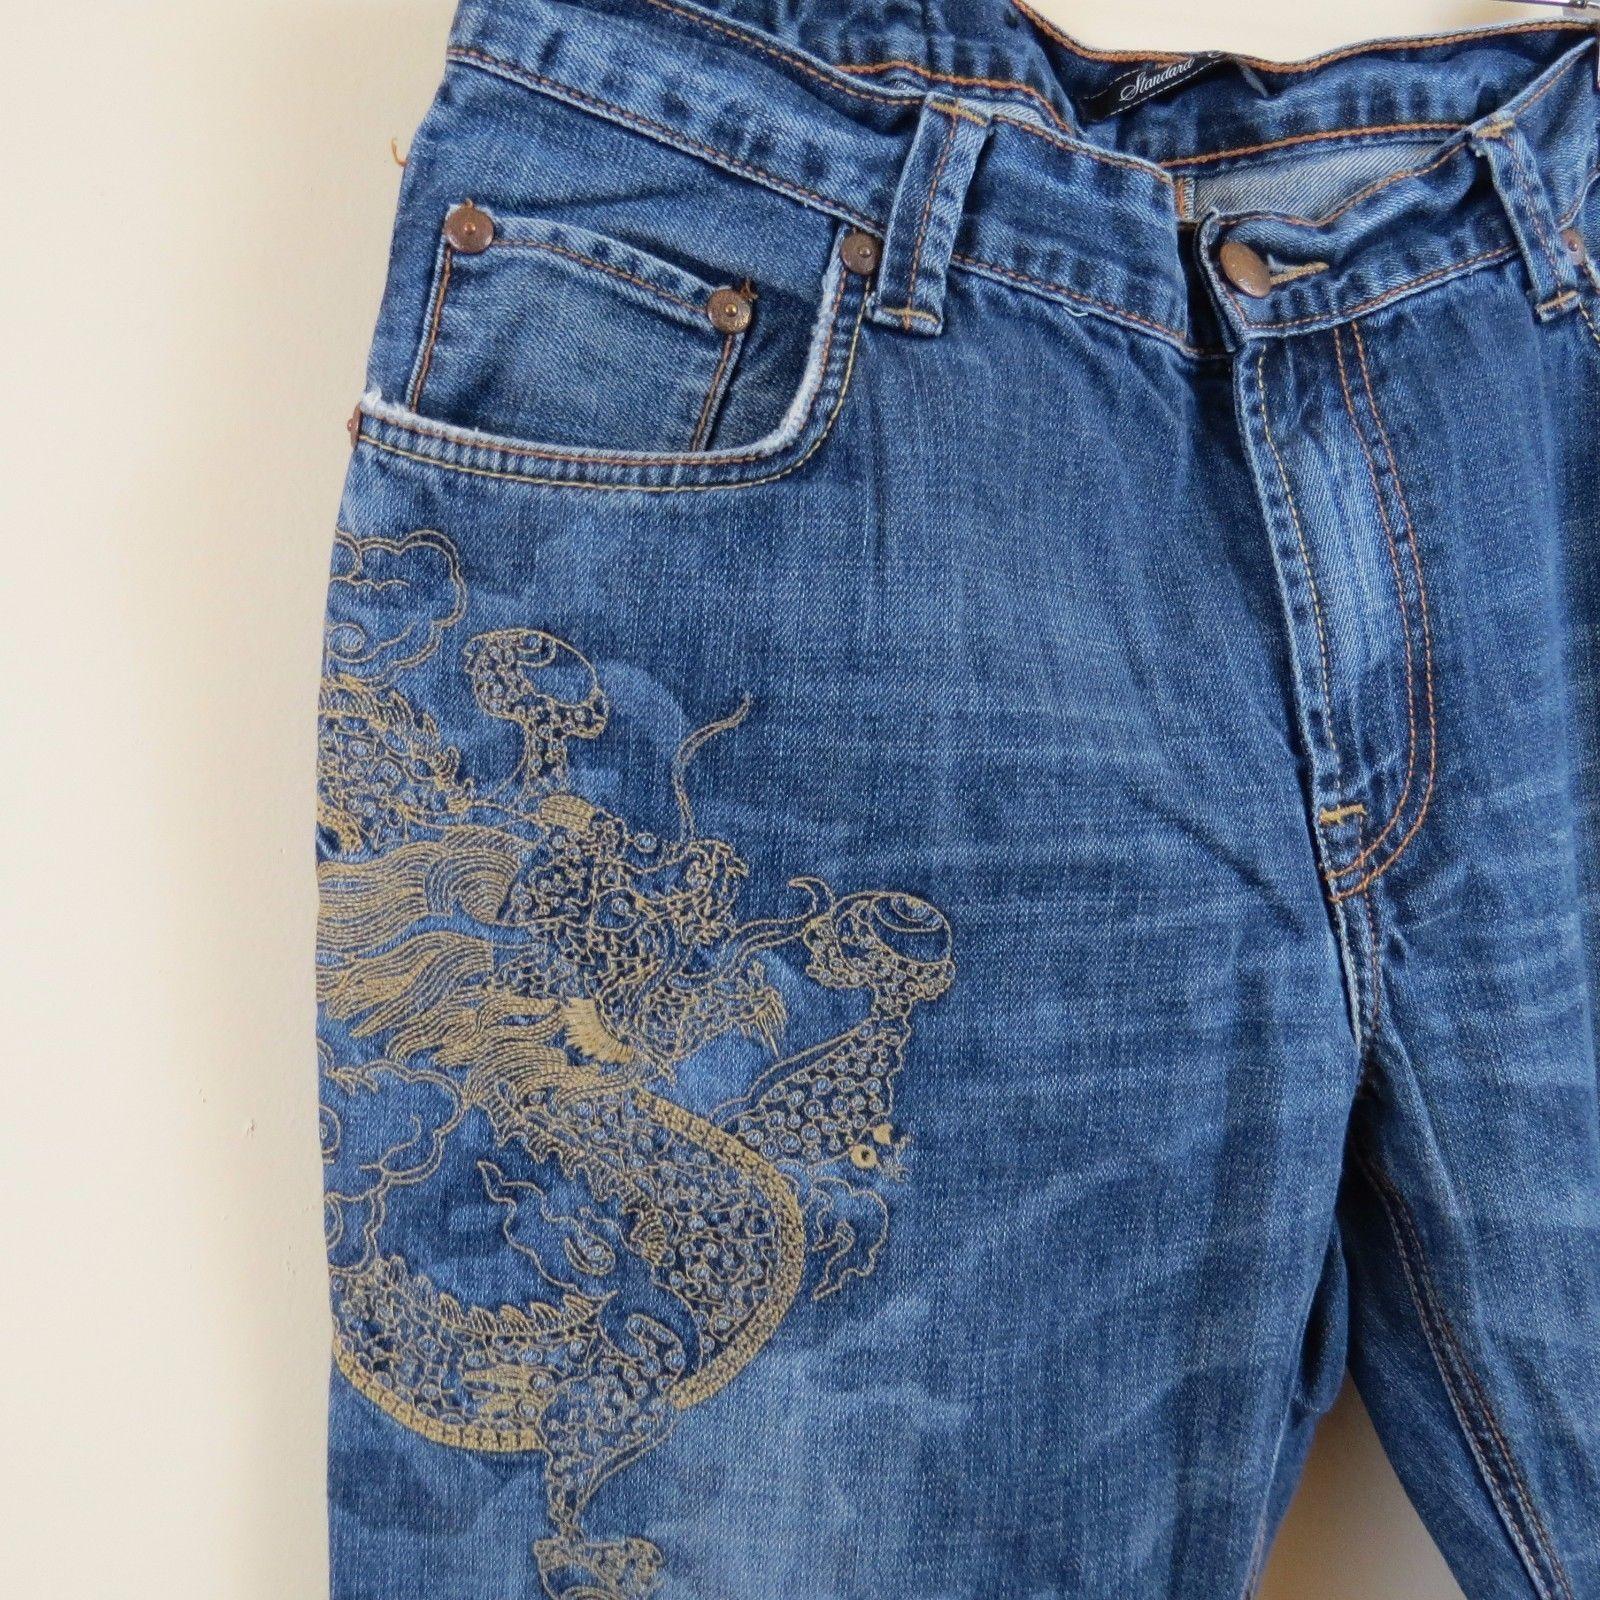 33443dd4 S l1600. S l1600. Previous. MARC ECKO Cut & Sew Standard Cut Embroidered Jeans  Men's Size 36 ...